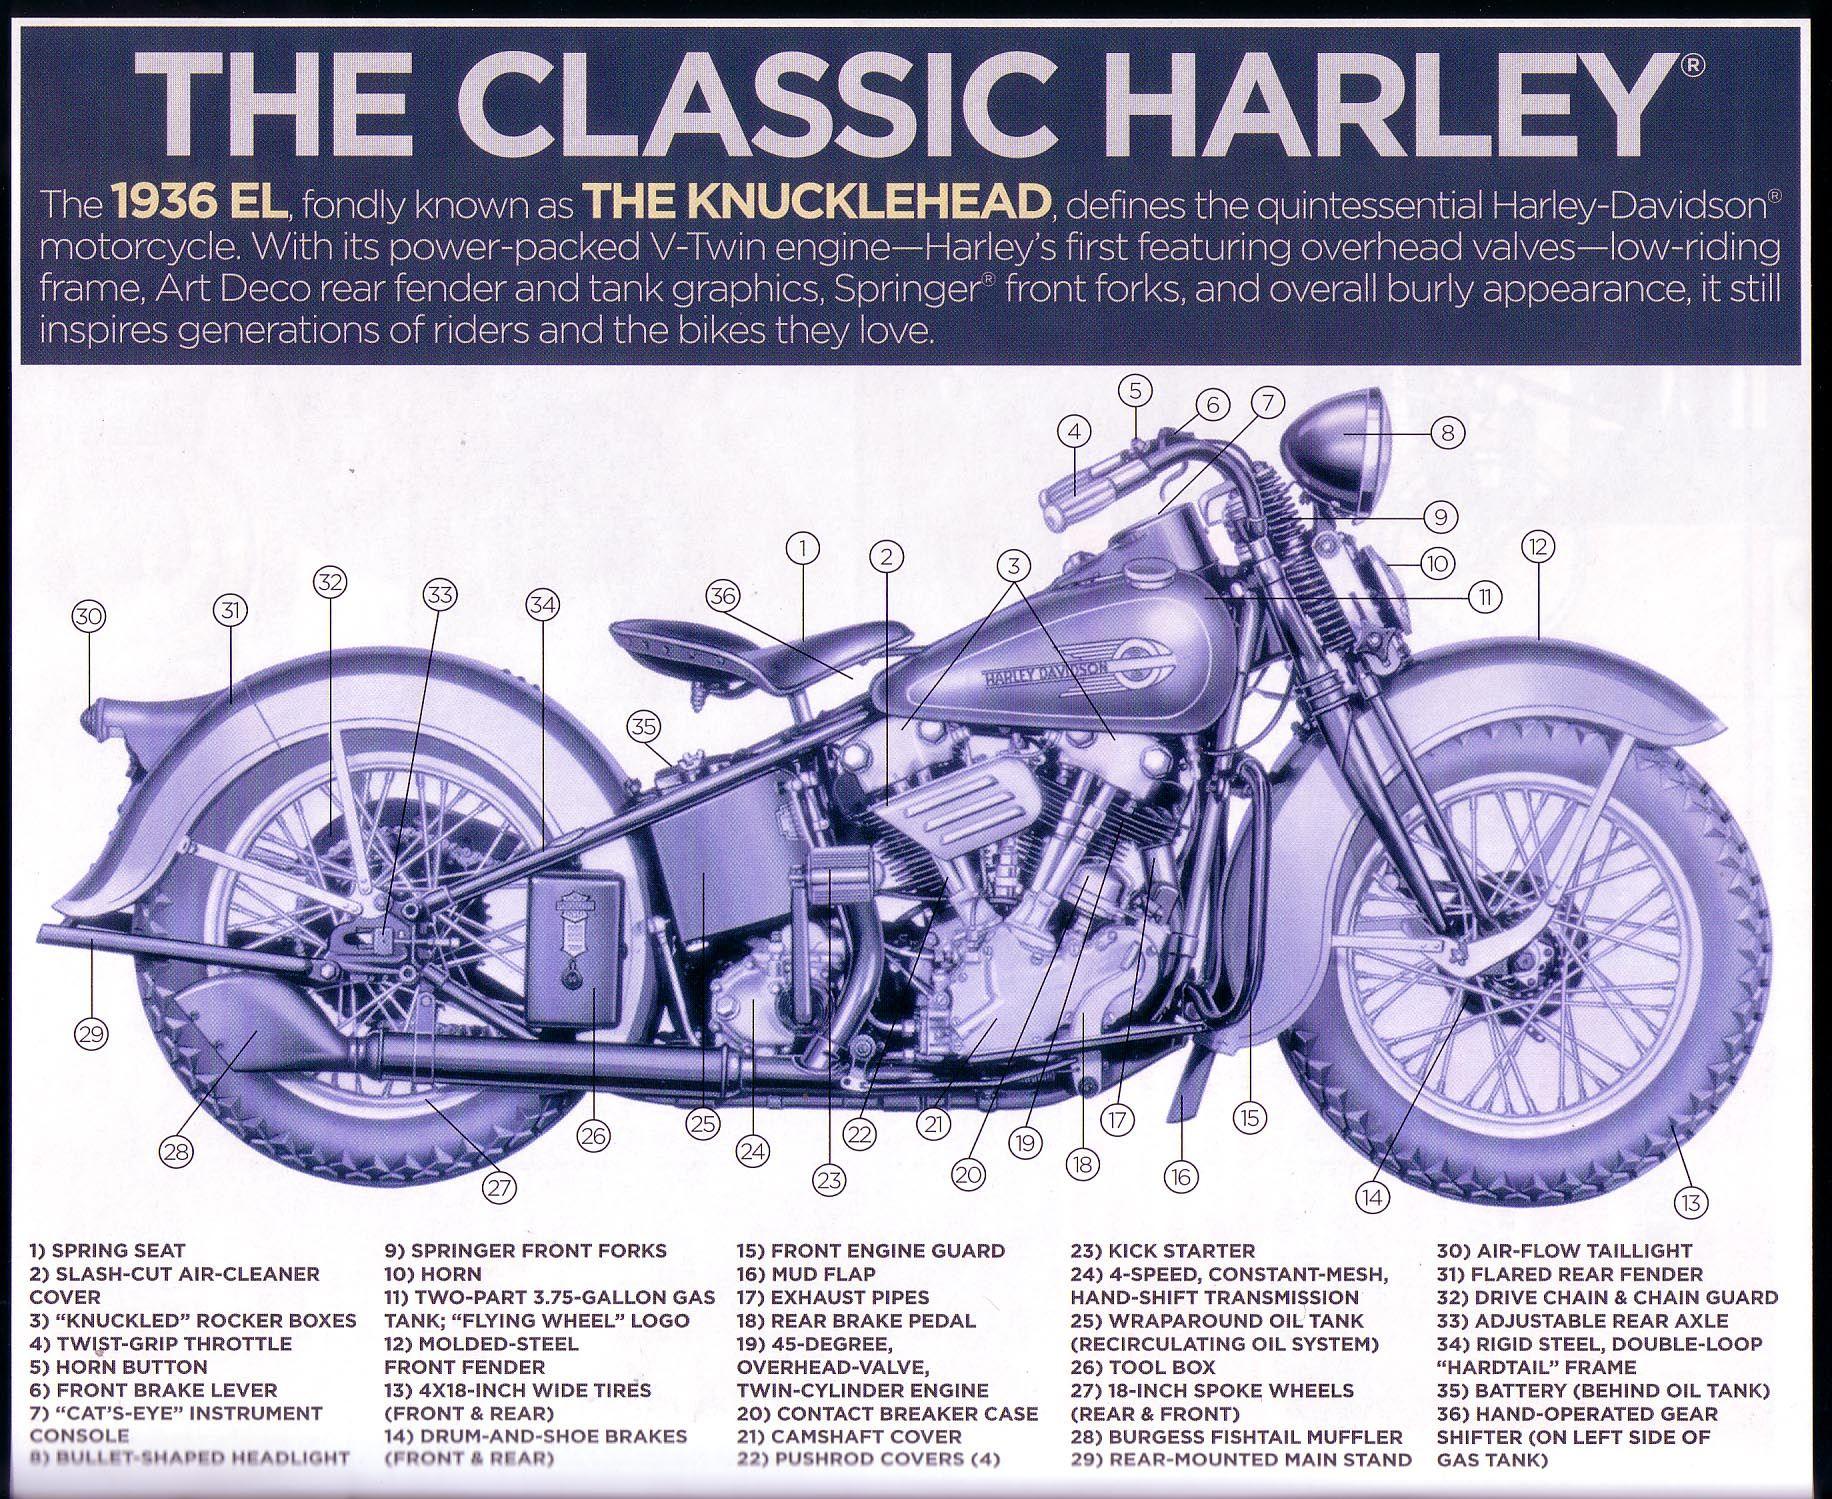 harley davidson motorcycle diagrams wiring diagram expert harley davidson motorcycle parts diagram harley davidson motorcycle diagrams [ 1832 x 1499 Pixel ]